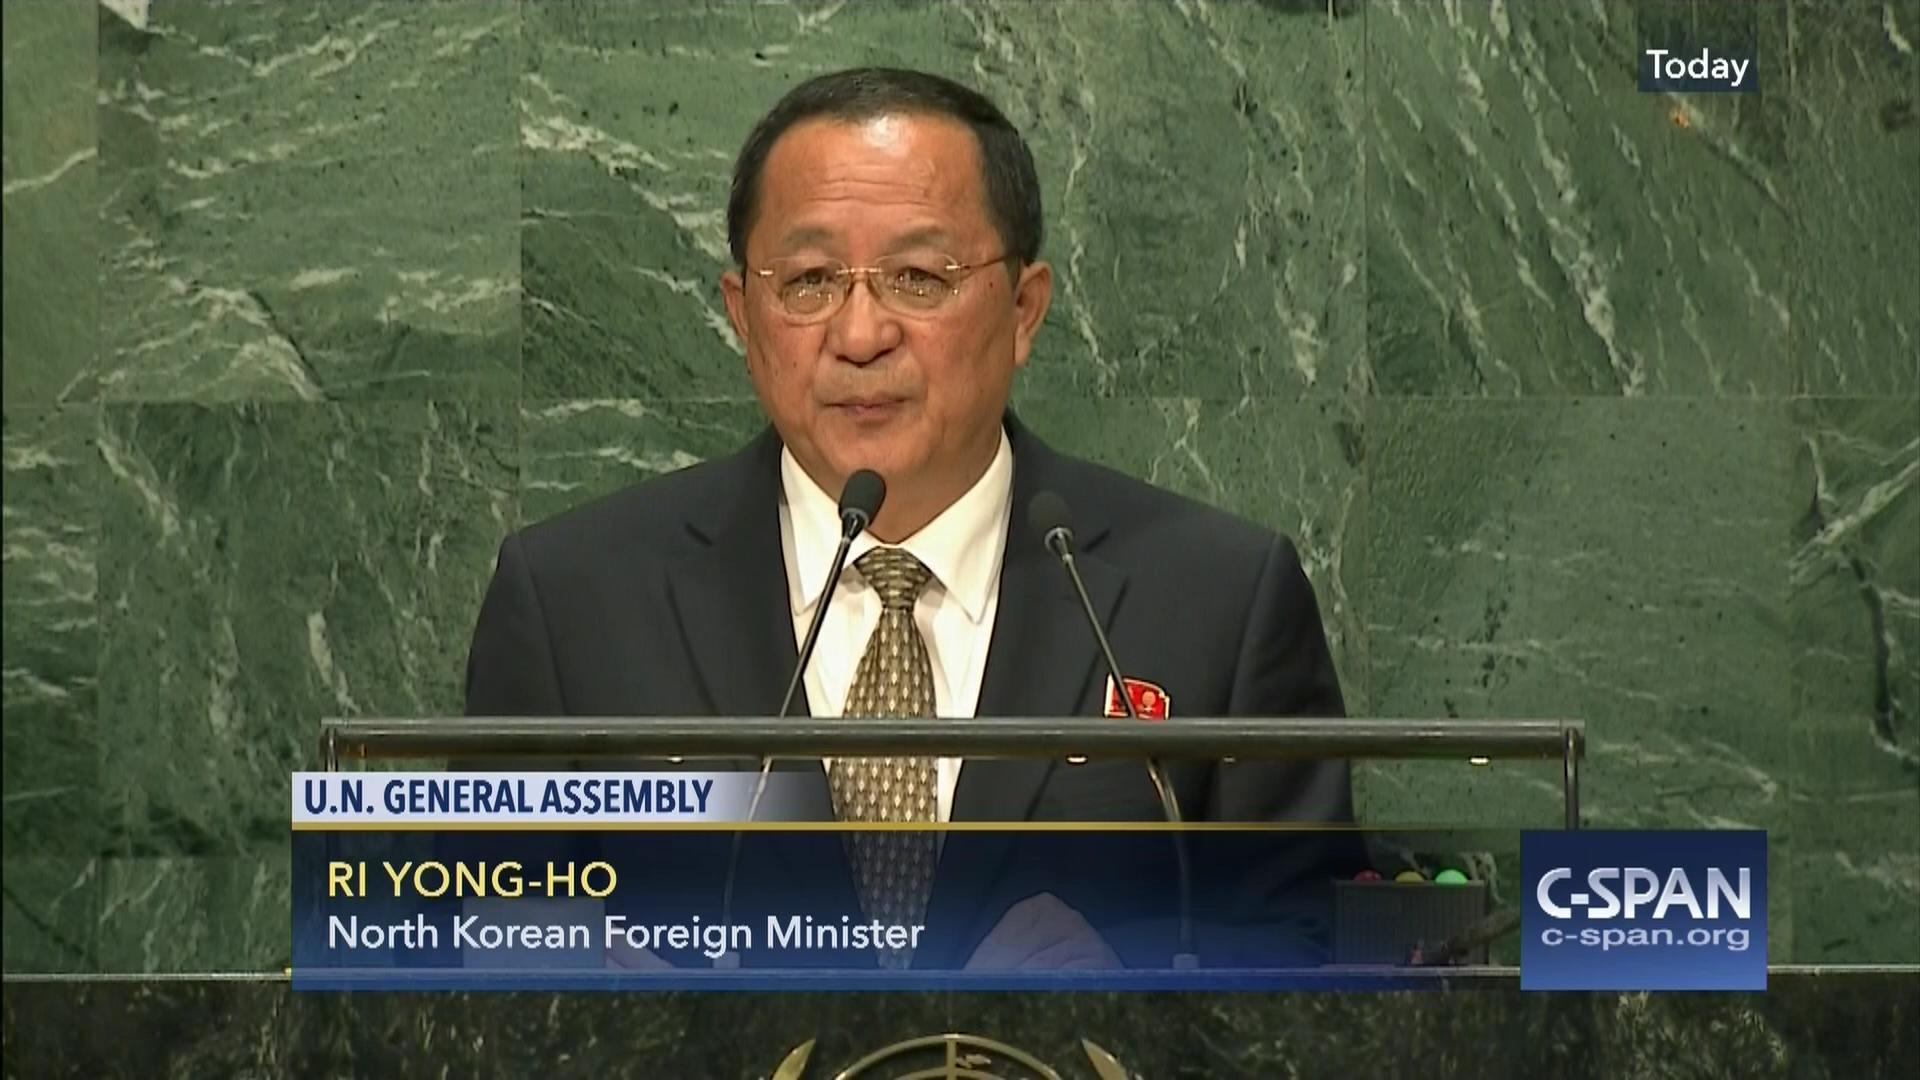 Resultado de imagem para picture of N. Korean FMat un ngeneral assembly